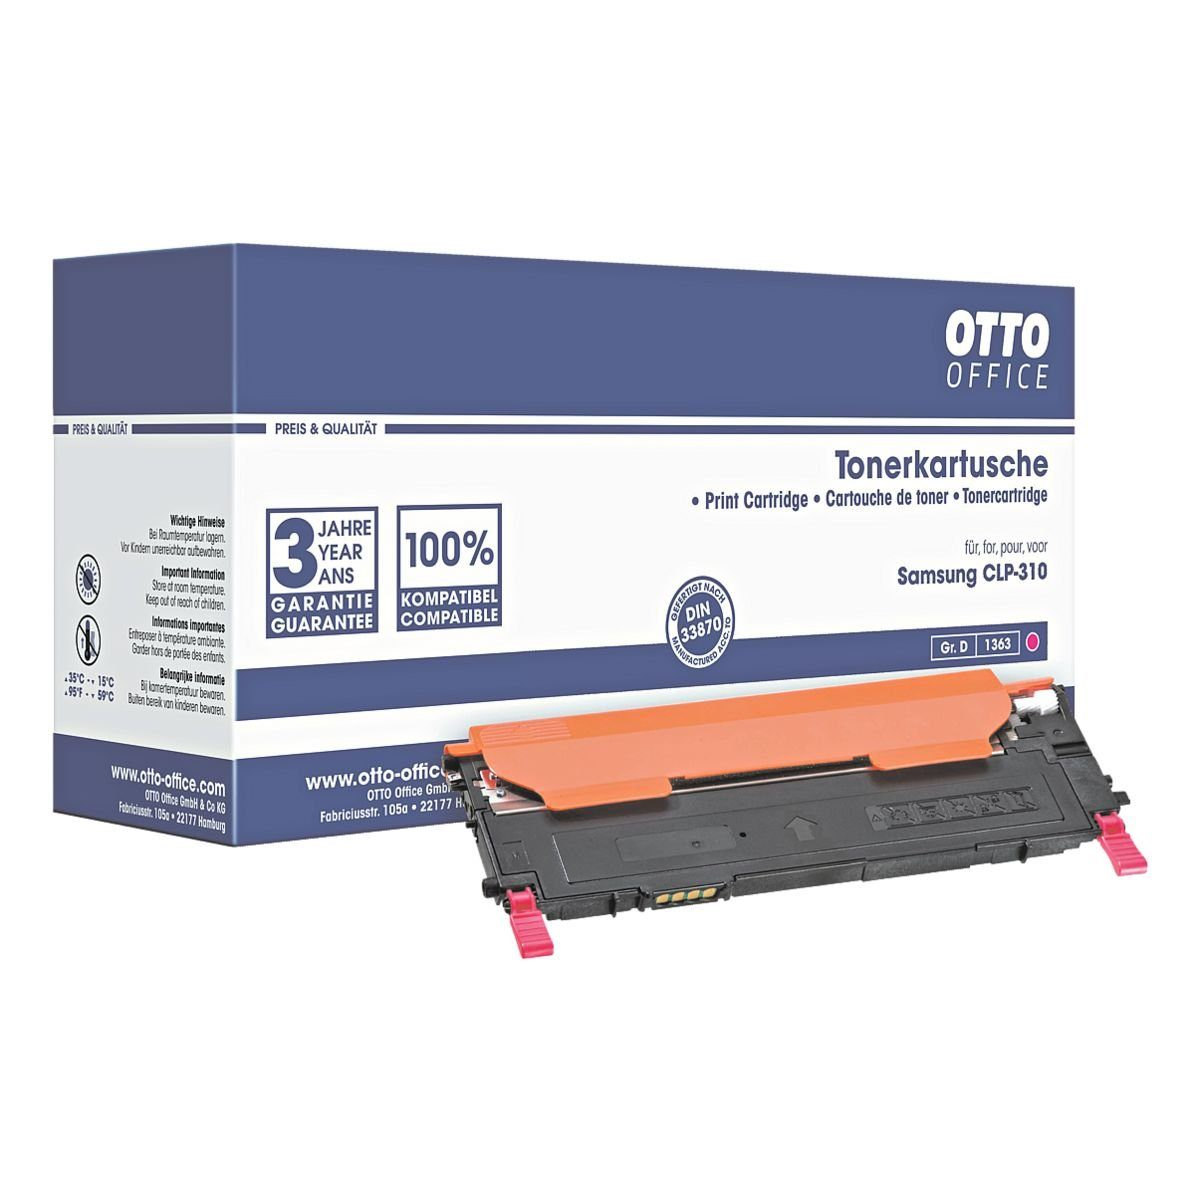 OTTO Office Standard Toner ersetzt Samsung »CLT-M4092«